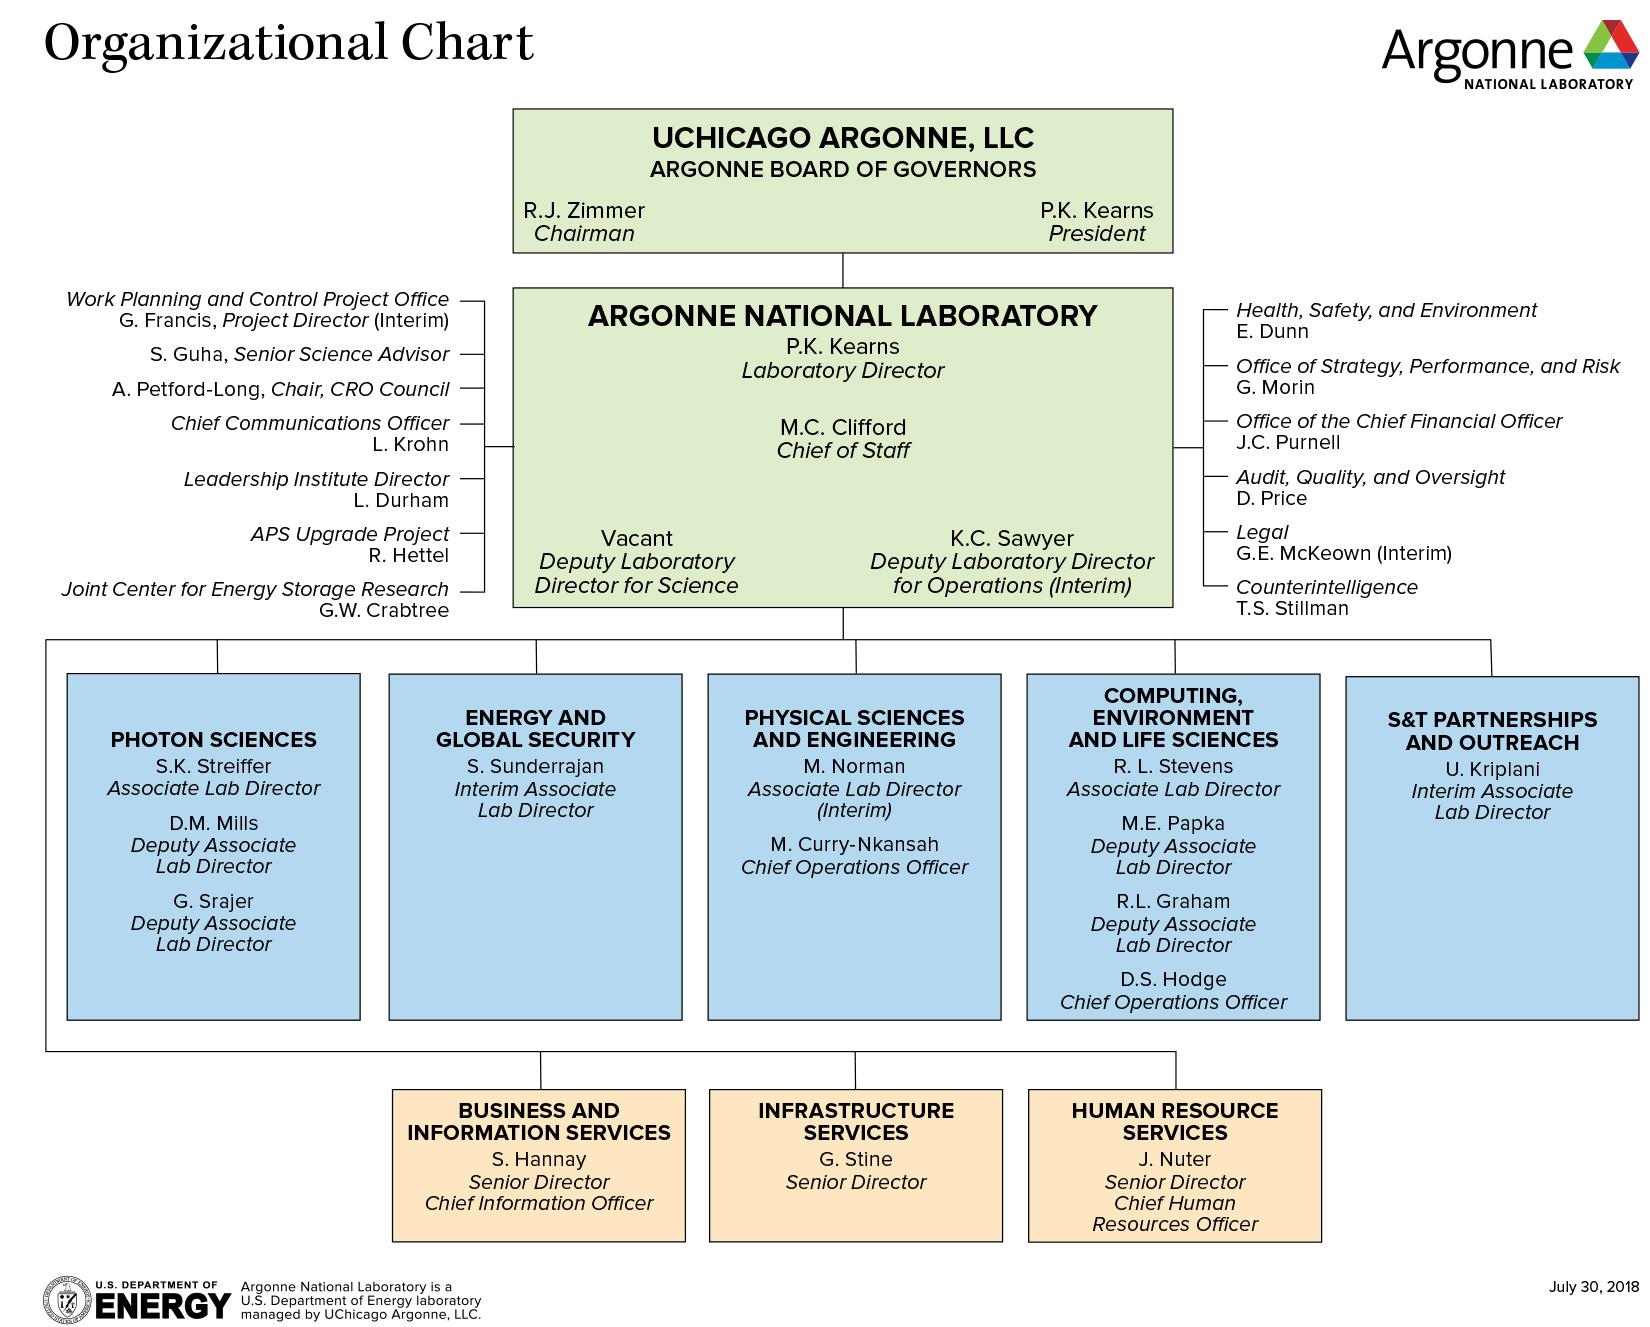 Argonne Organizational Chart | Argonne National Laboratory